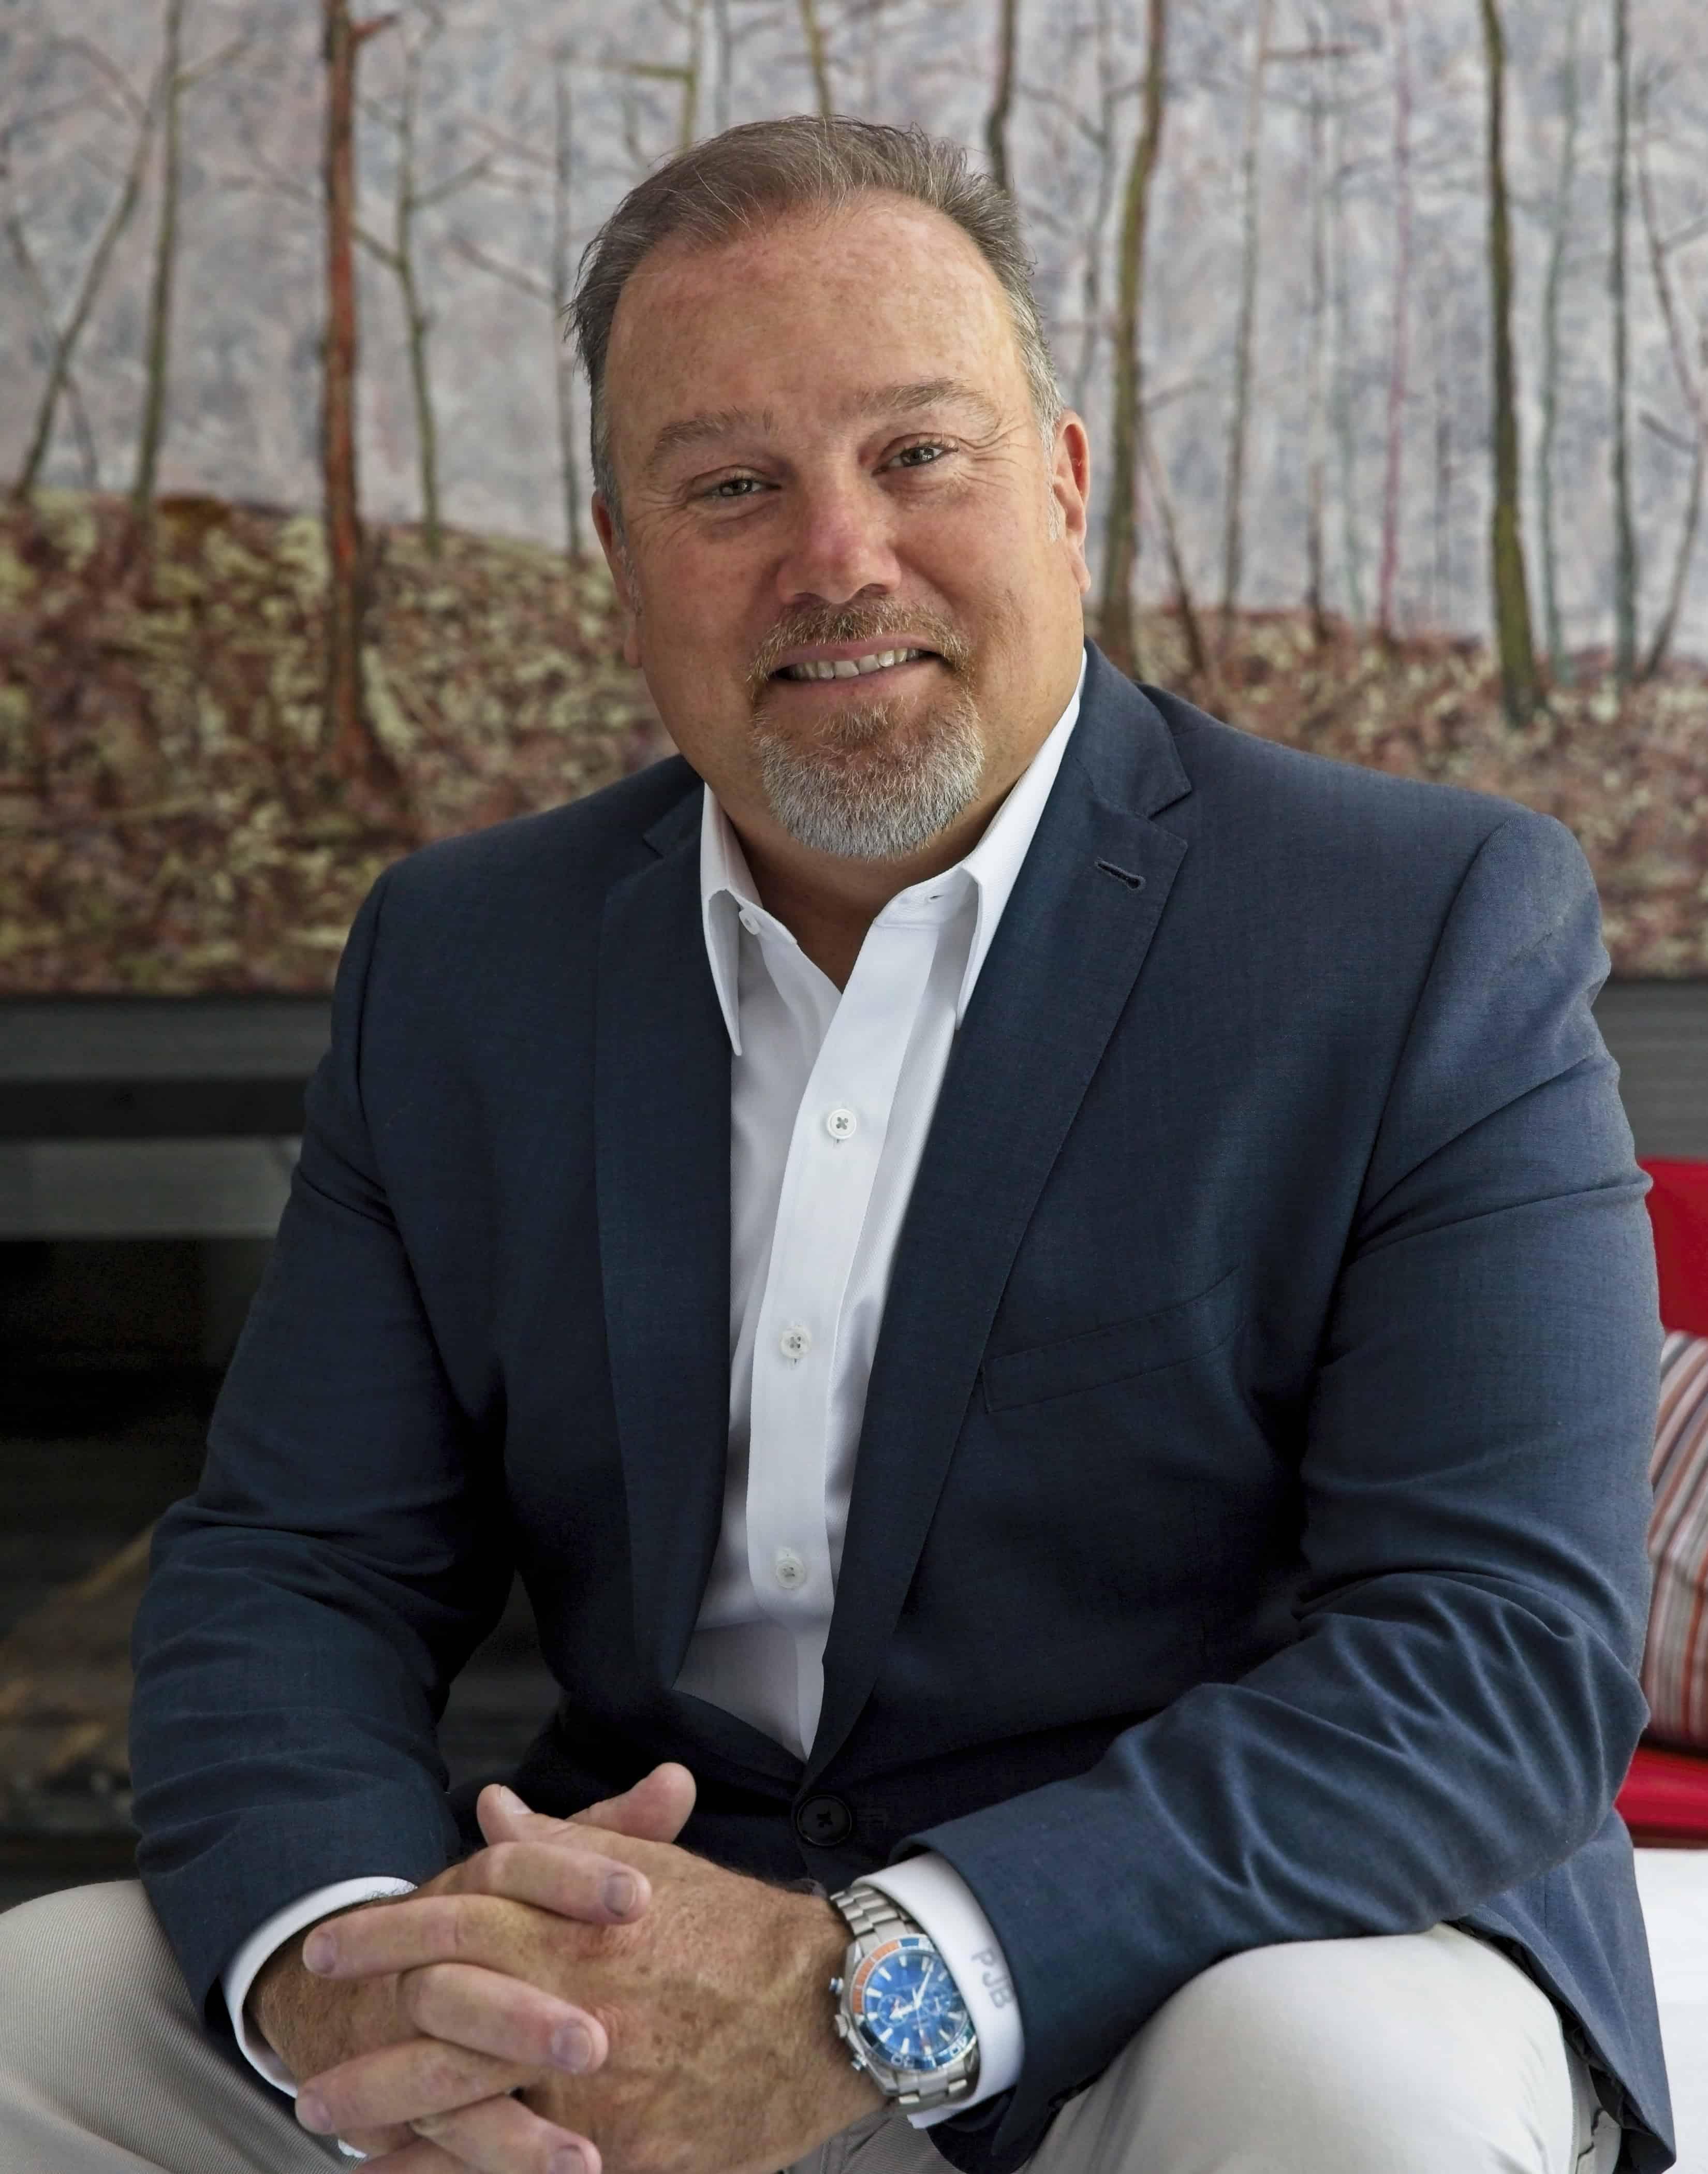 Peter Braun